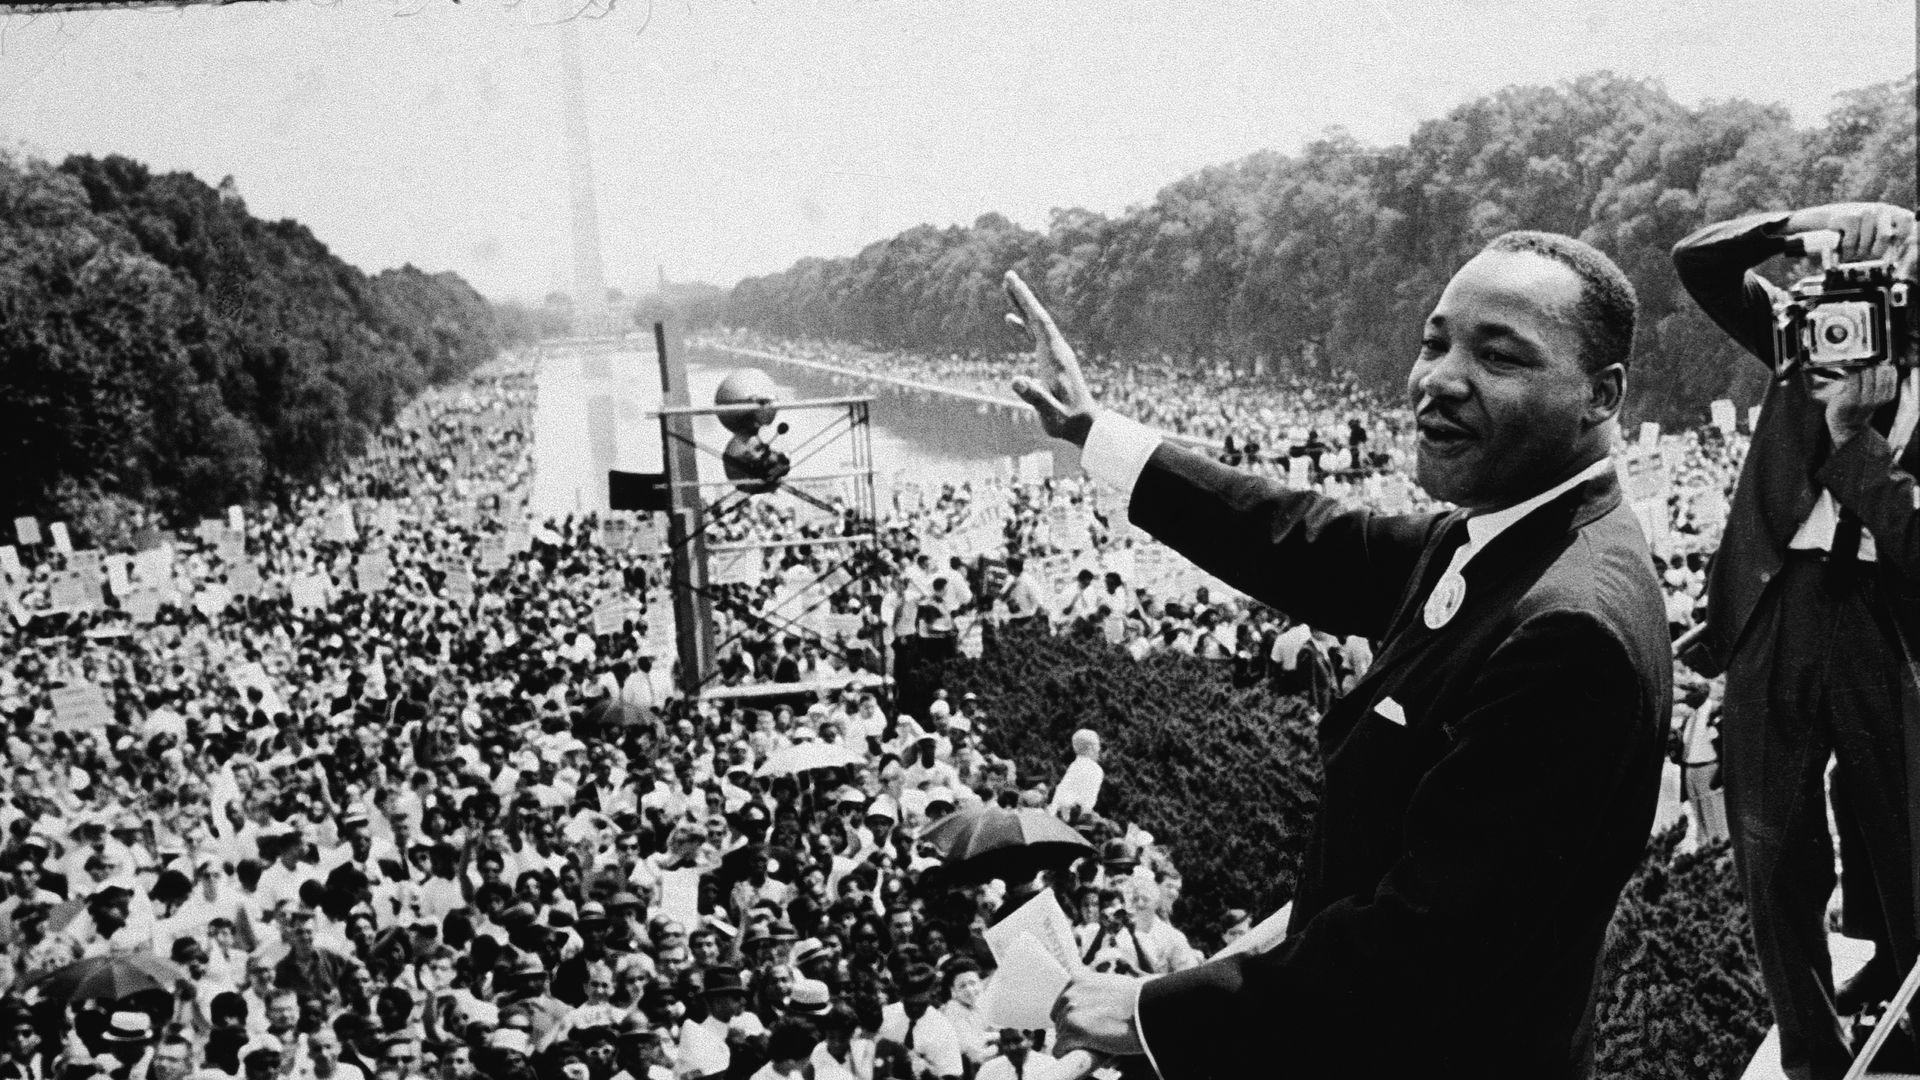 Enraging Culture: MLK 50 Fallout